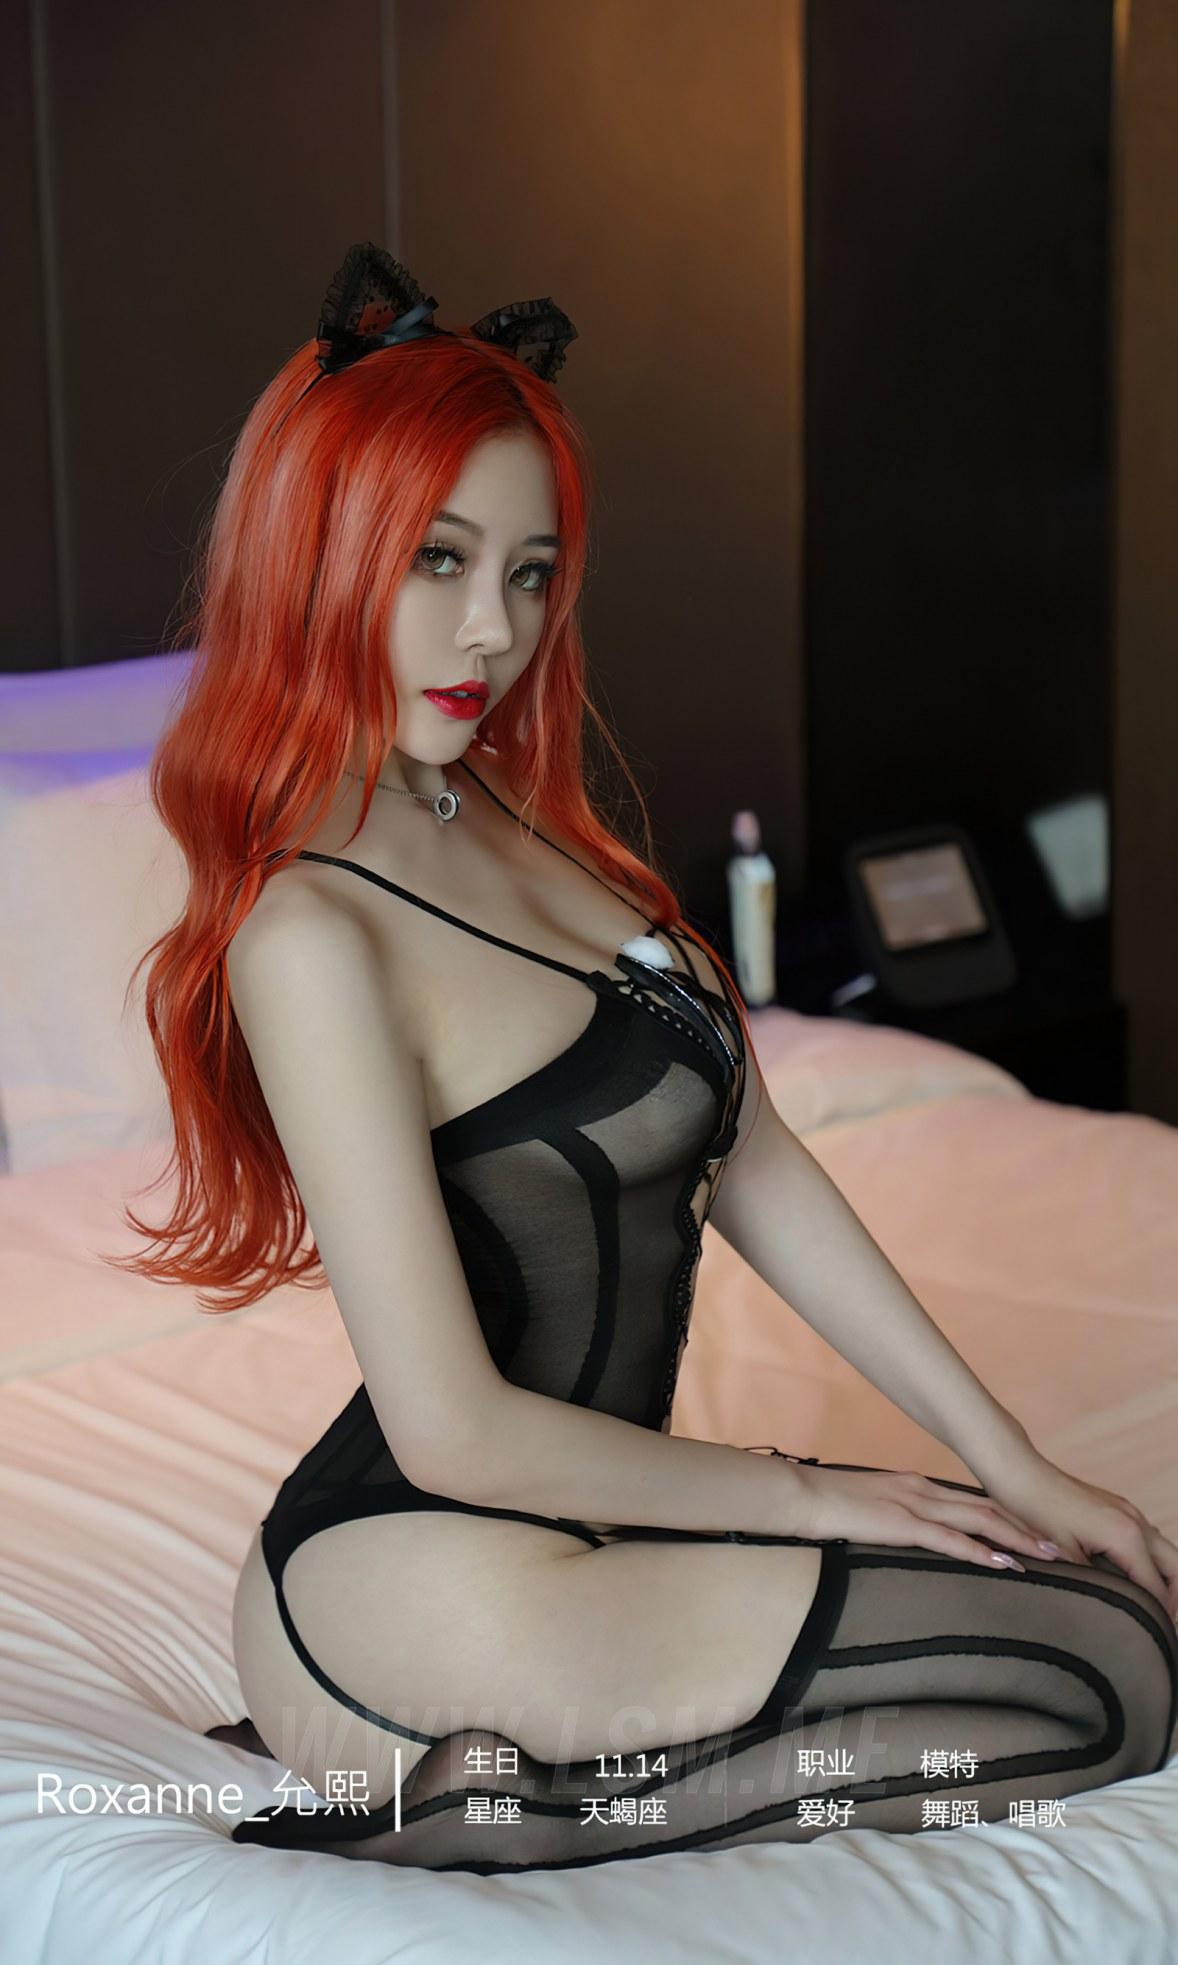 UGirls 爱尤物 No.2073 允熙 红皇后 - 4